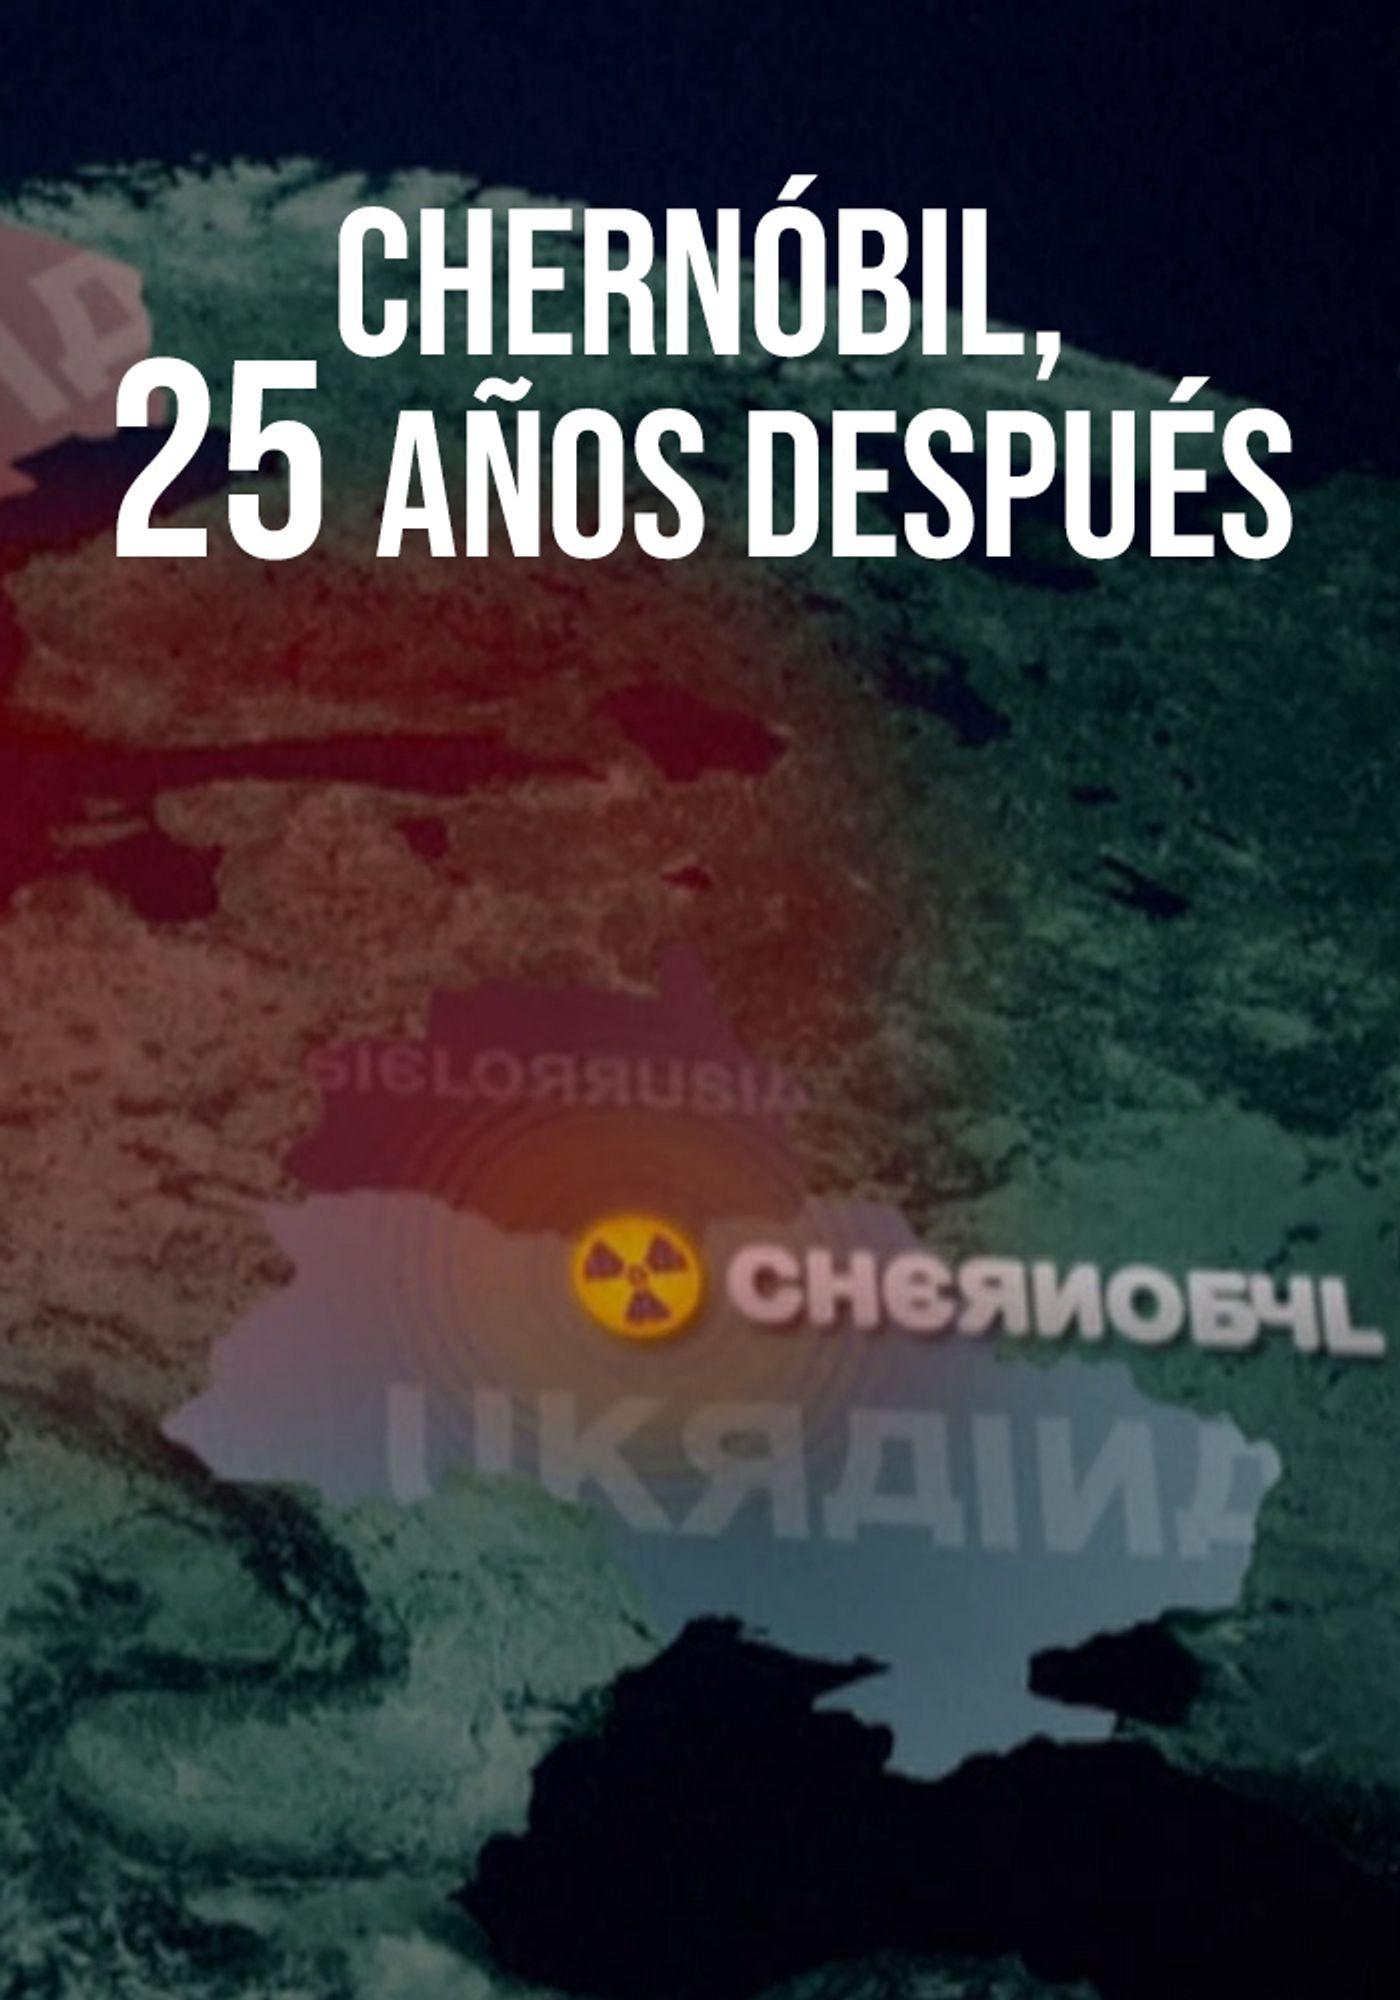 Chernóbil, 25 años después